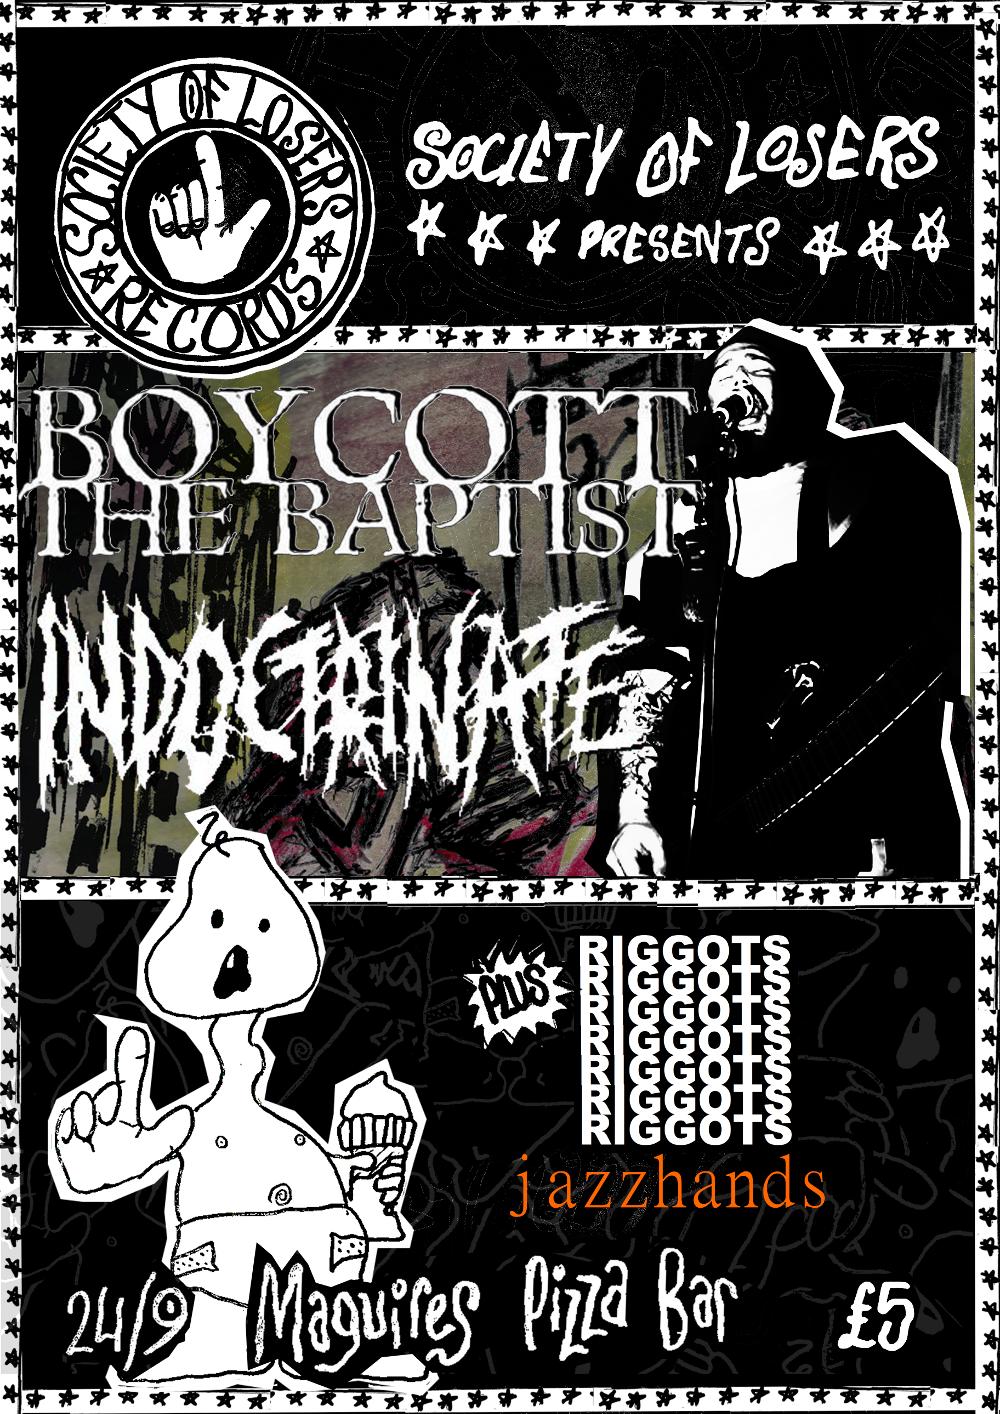 boycottposterweb.png